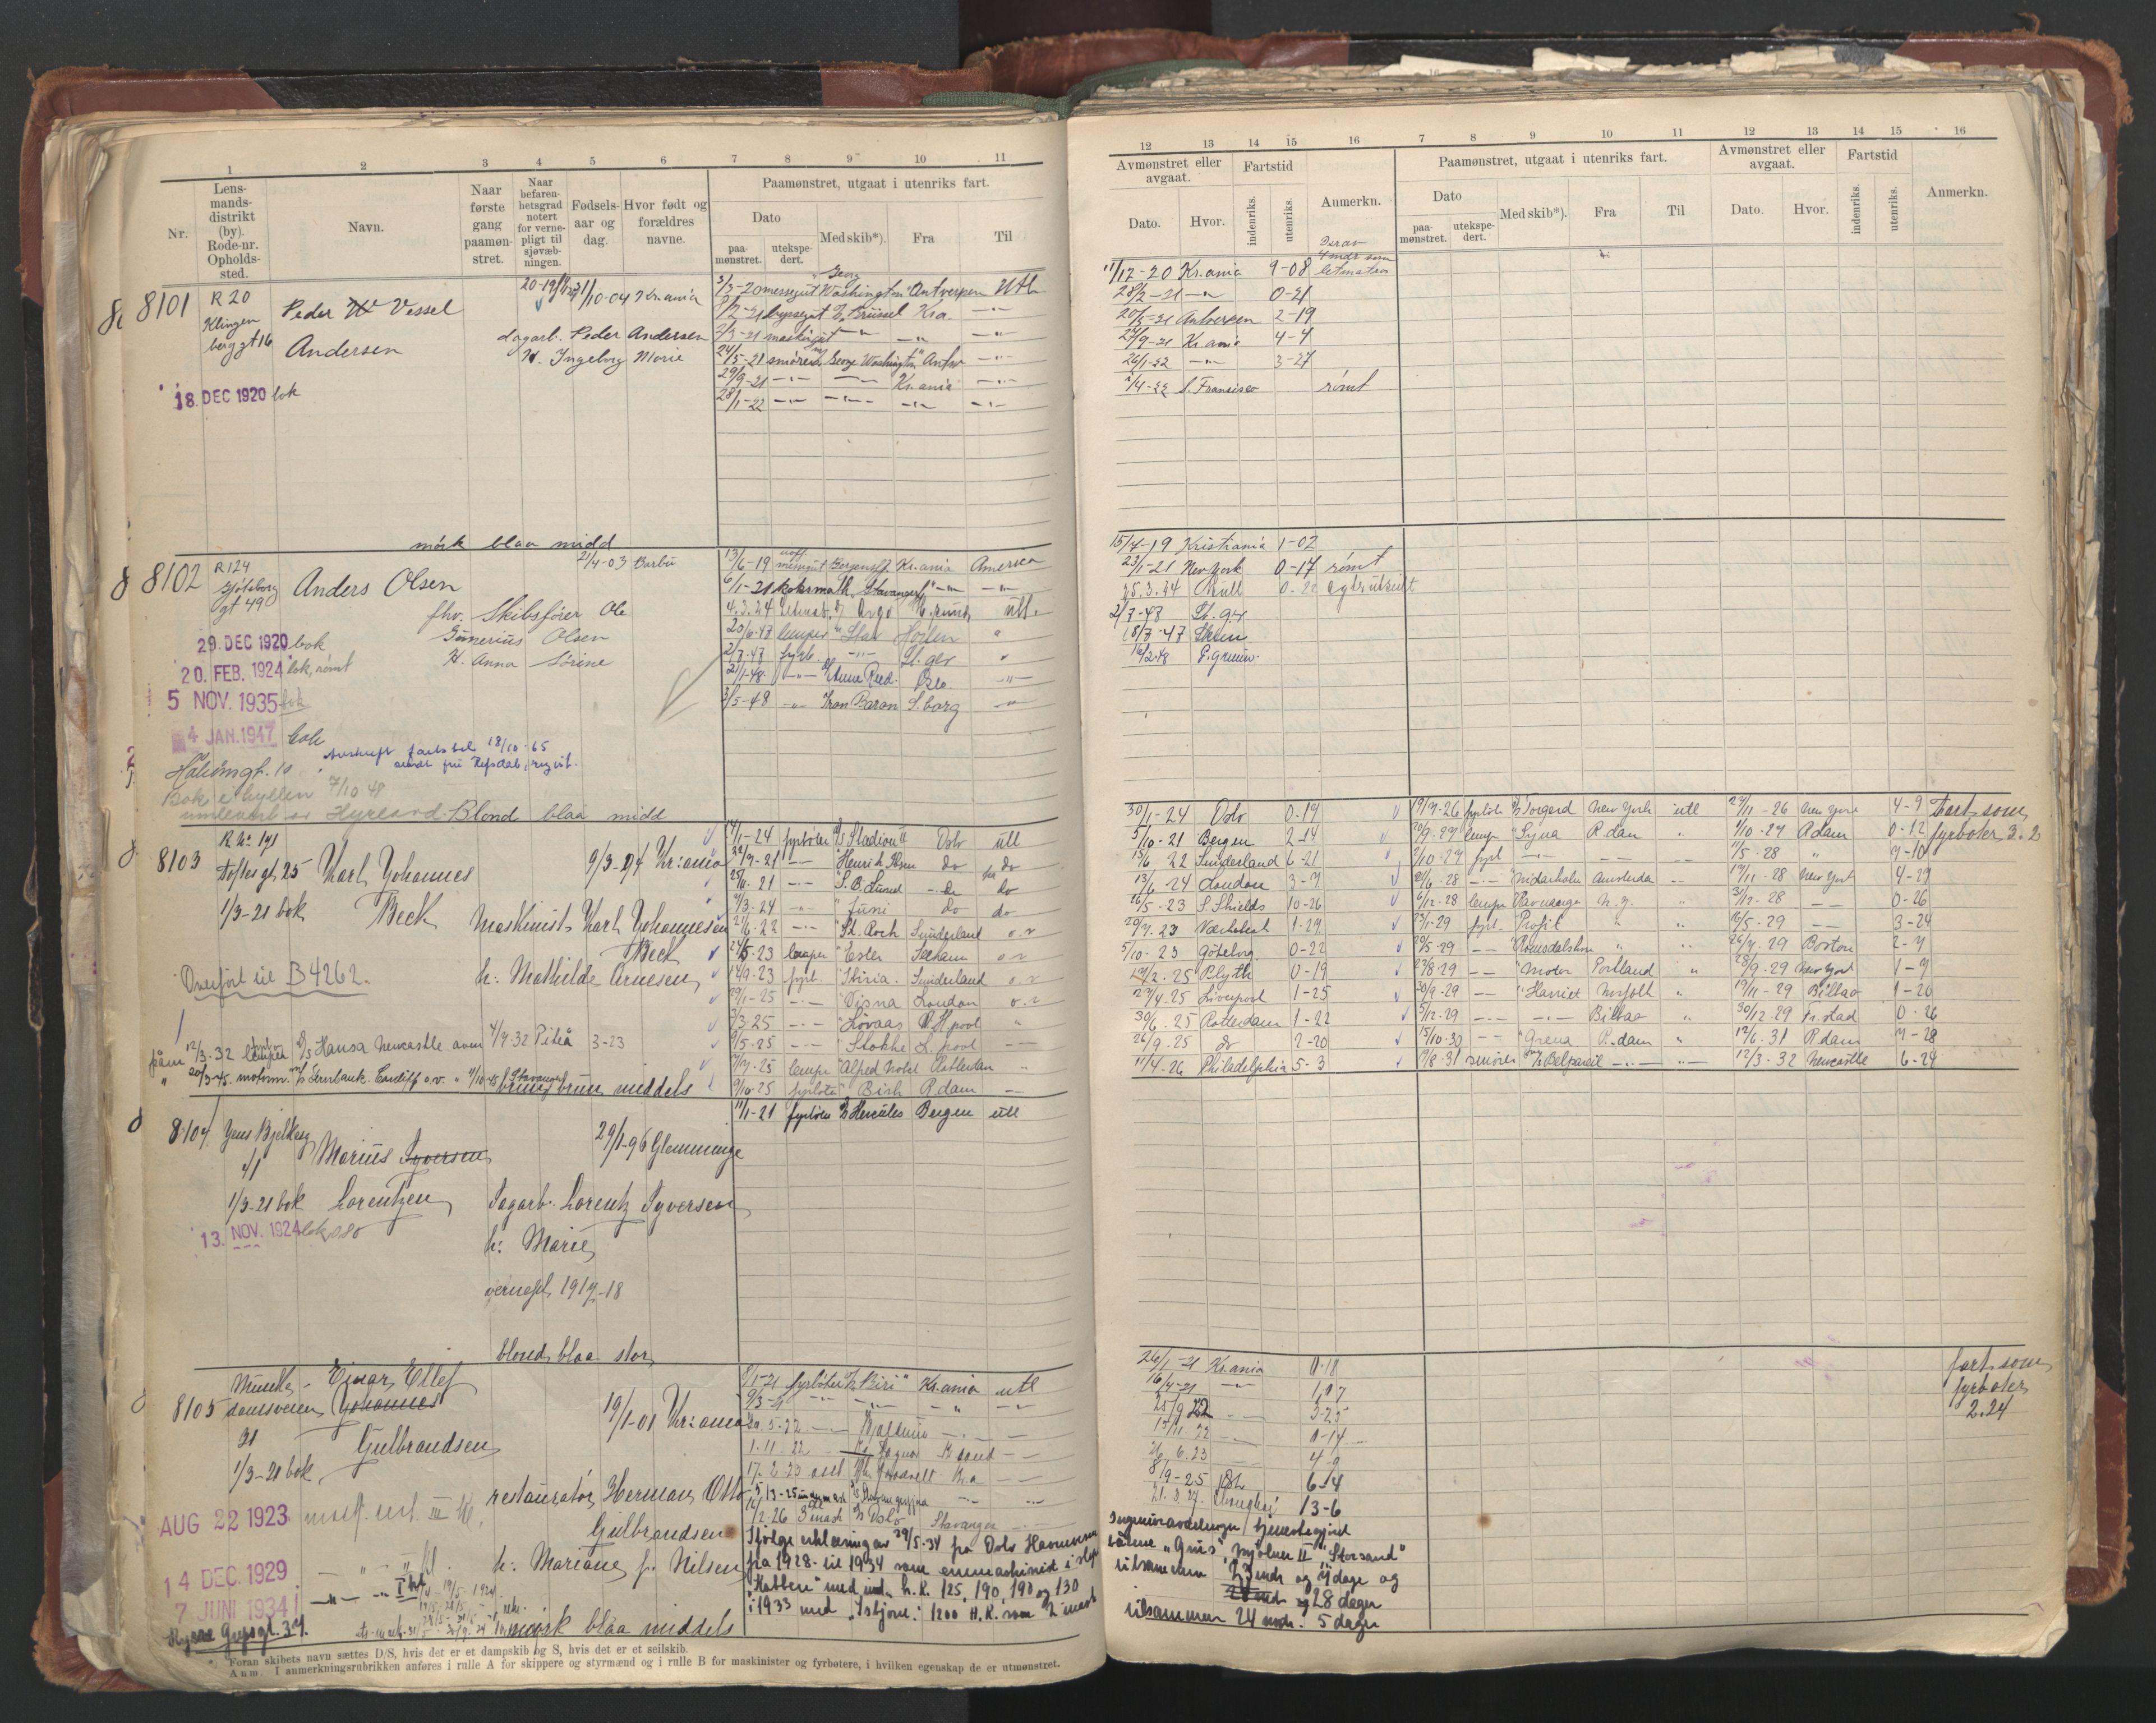 SAO, Oslo sjømannskontor, F/Fc/L0006: Hovedrulle, 1918-1930, s. 110